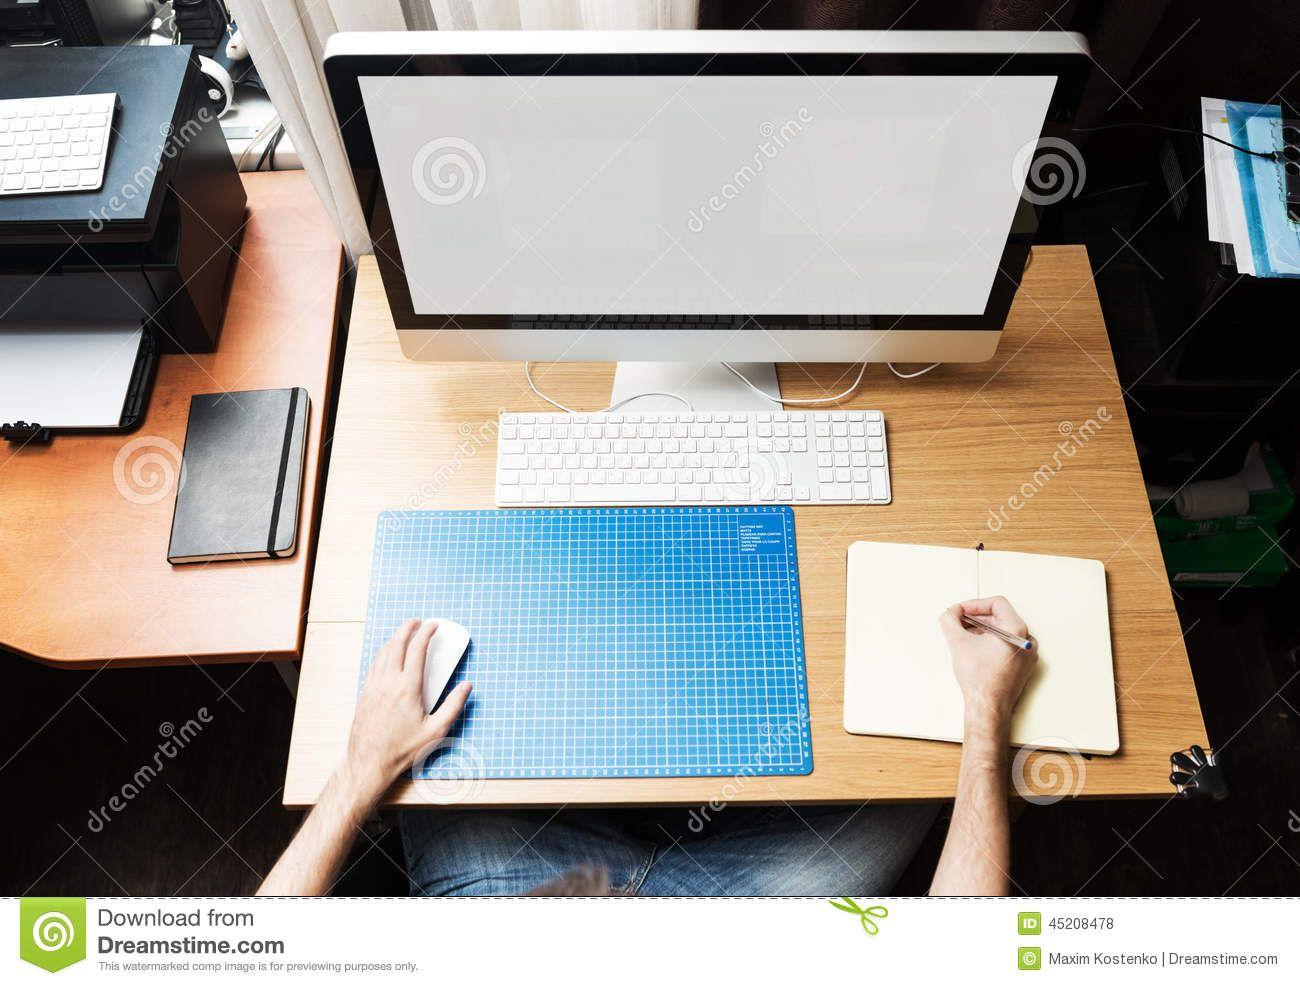 Online Typing Job Mobile Typing Jobs Online Typing Jobs Online Jobs